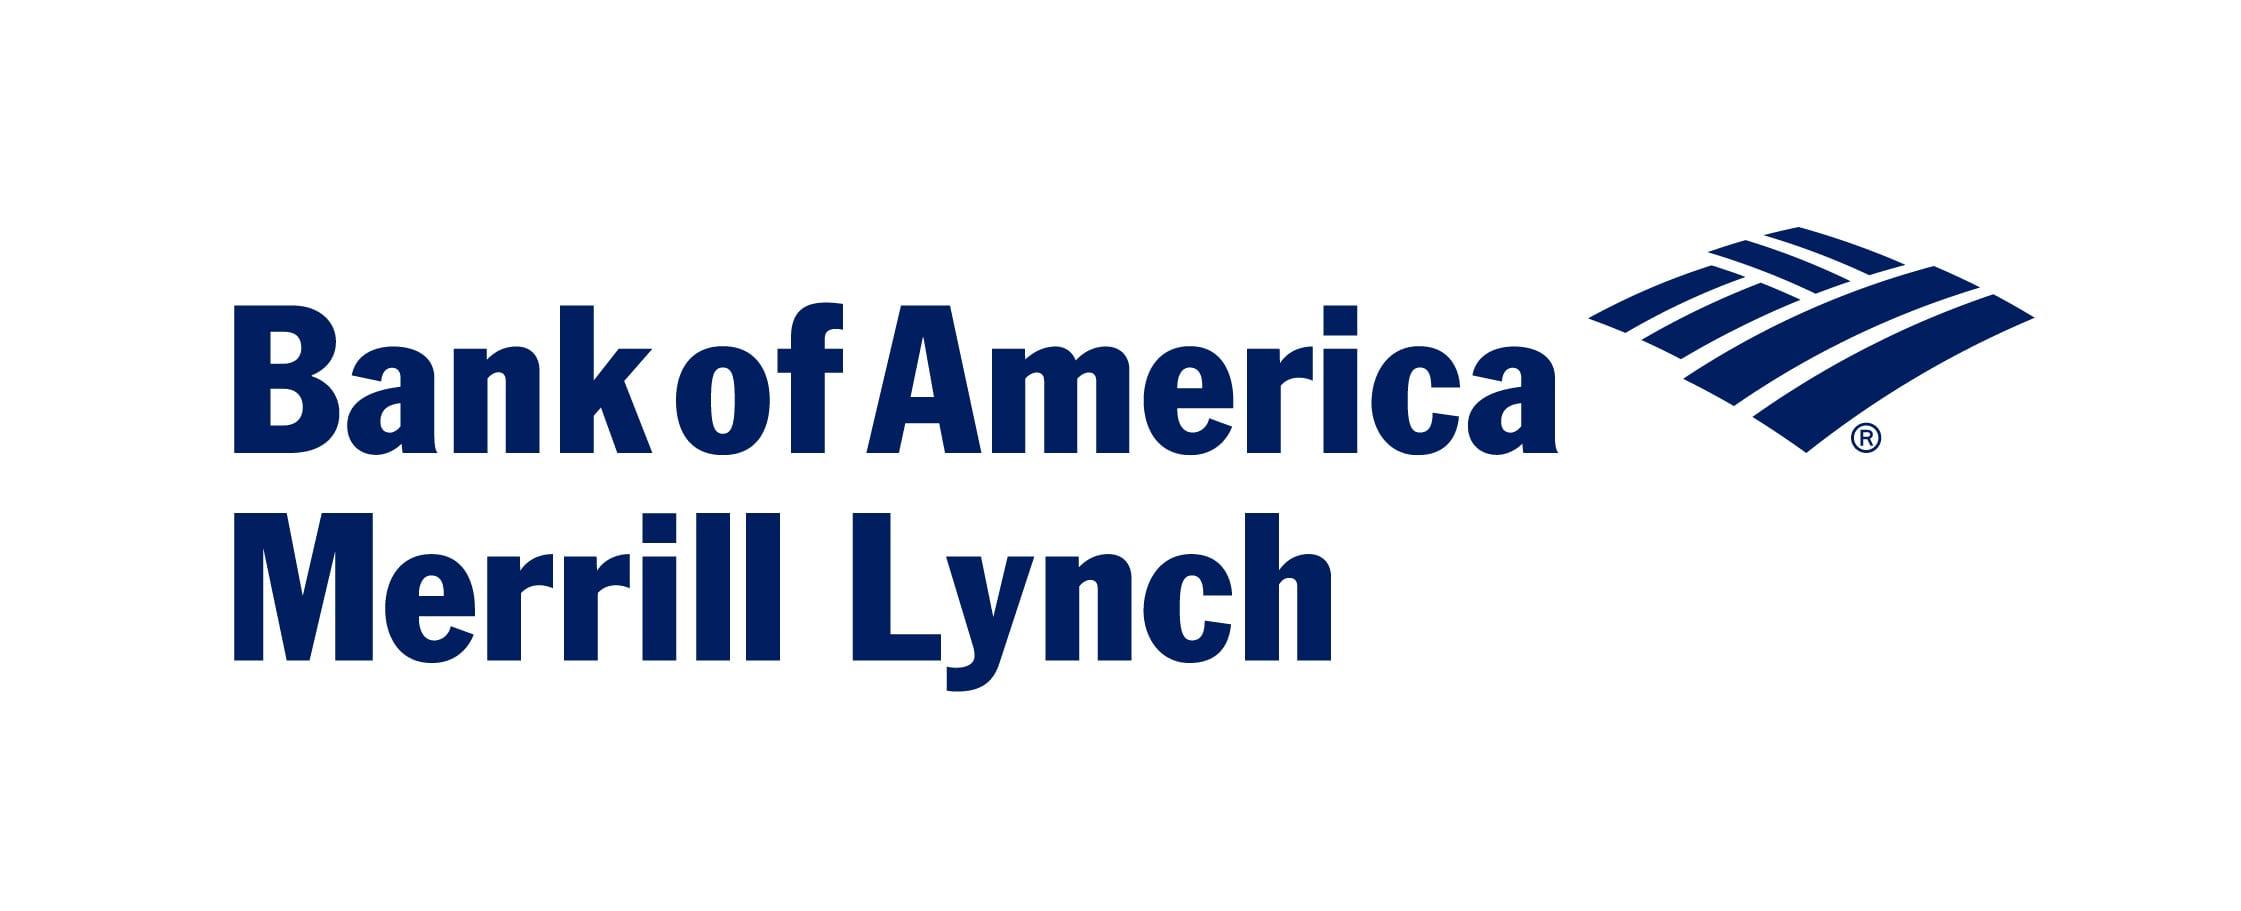 Bank of America Merrill Lynch South Africa Global Banking And Marketing (GBAM) Internship Program 2019 – Johannesburg, South Africa